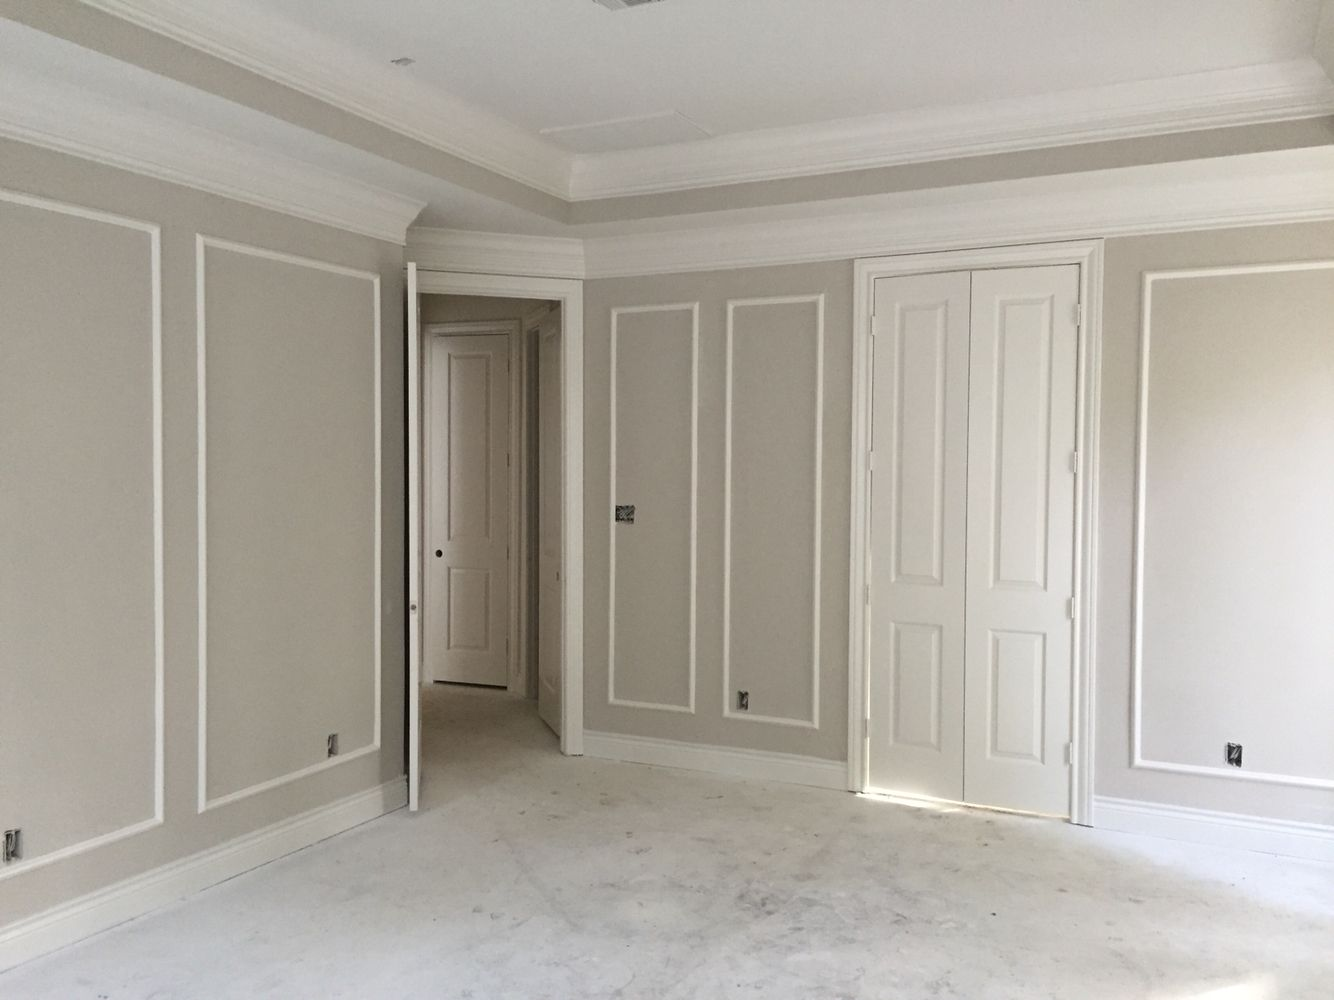 Best Master Bedroom Paint Is Sw Accessible Beige Double 400 x 300